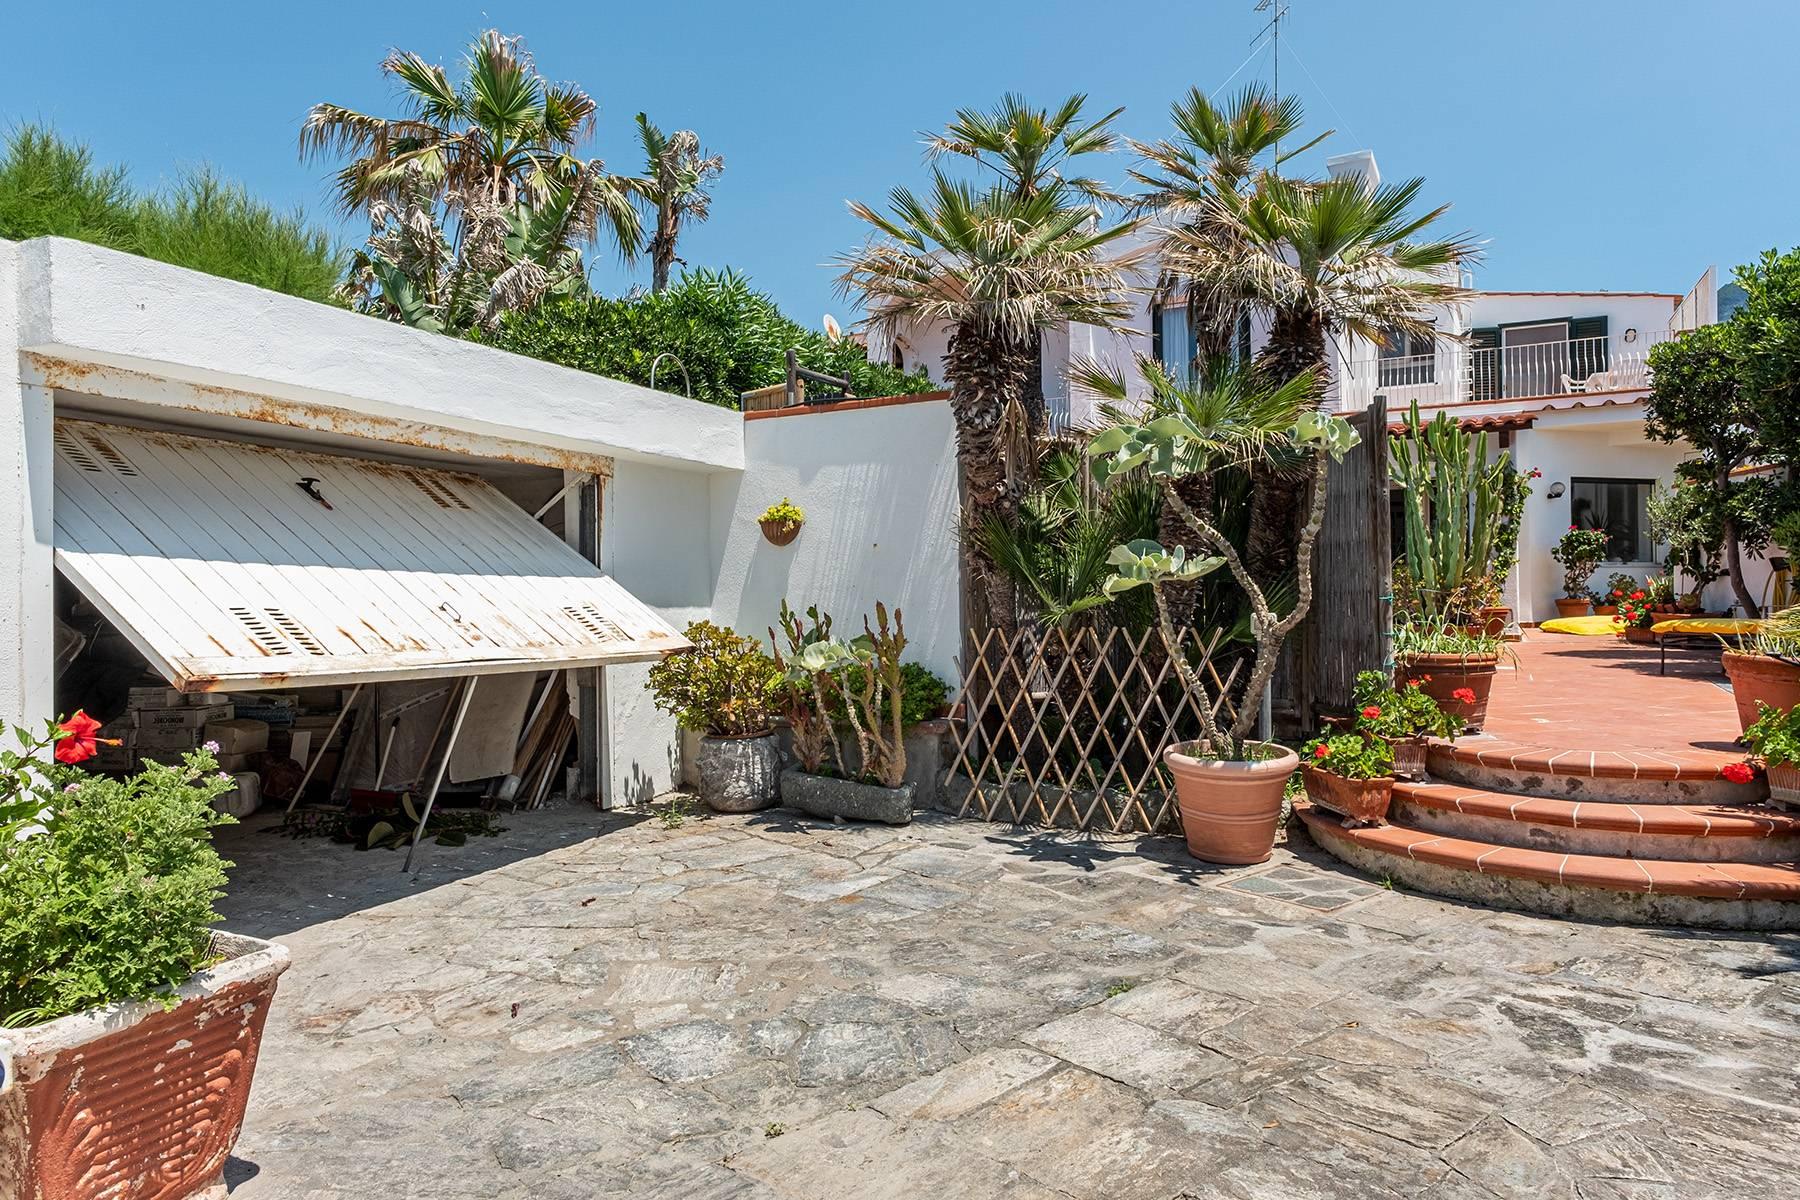 Villa in Vendita a Ischia: 5 locali, 400 mq - Foto 21